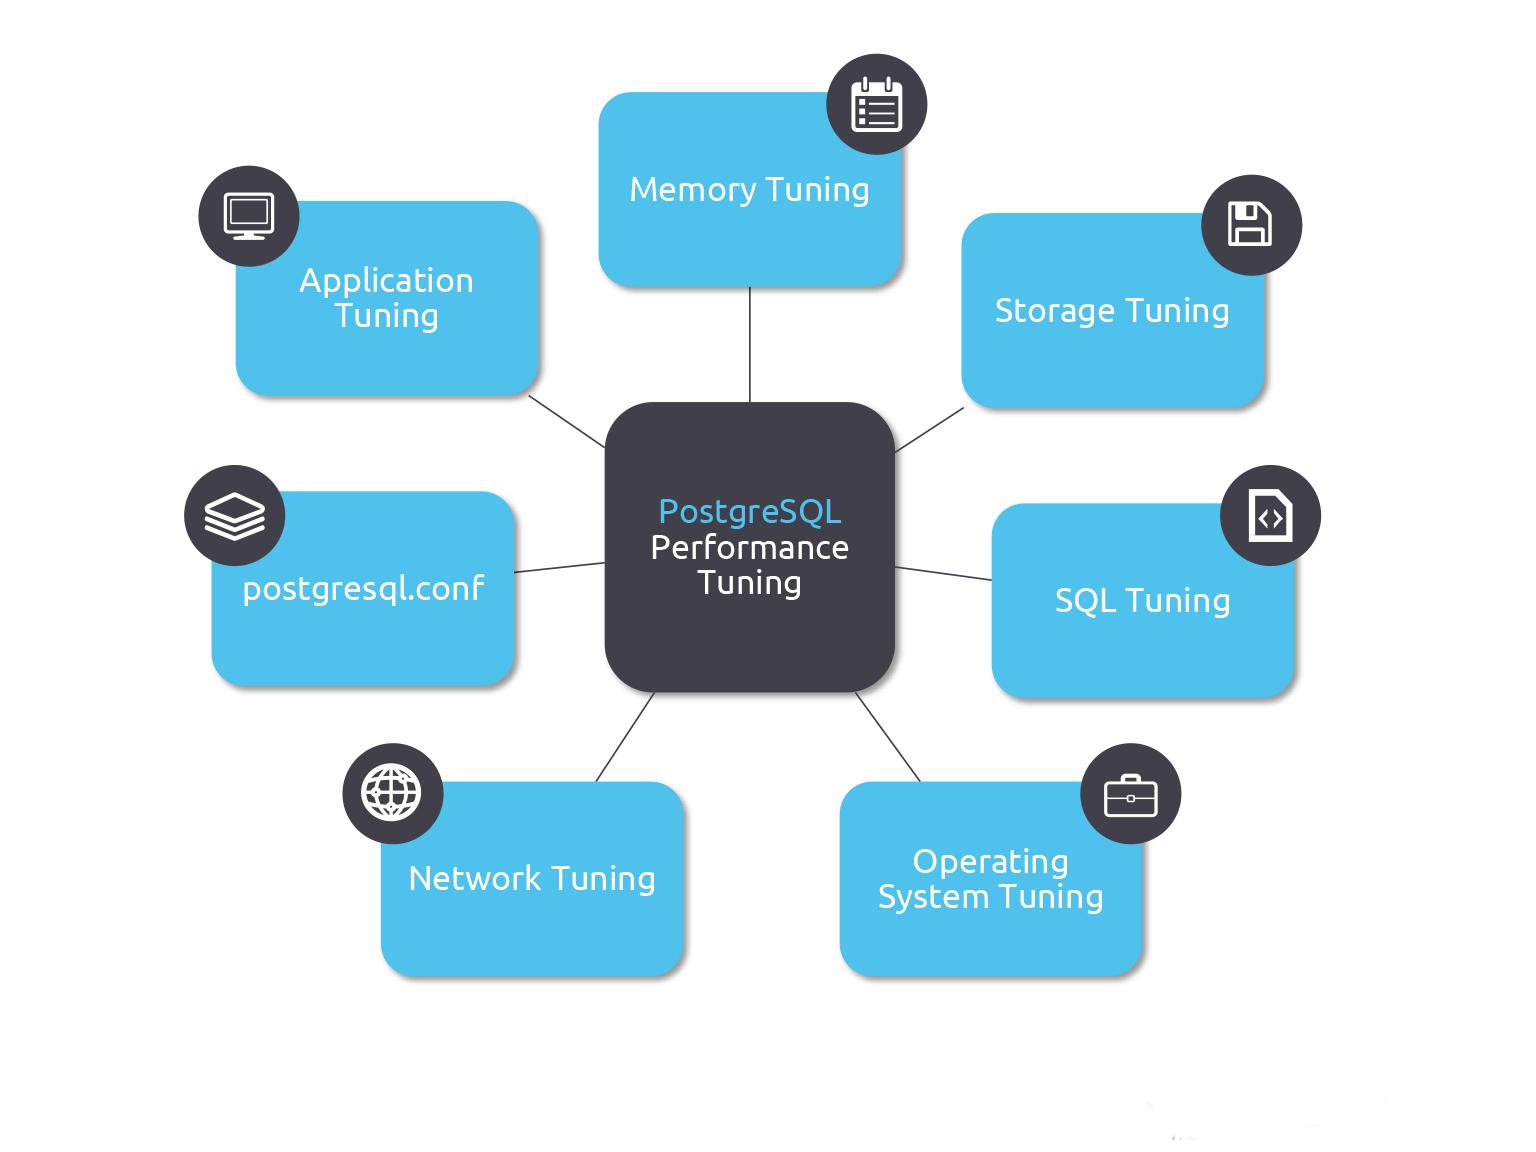 postgre-sql-performance-tuning